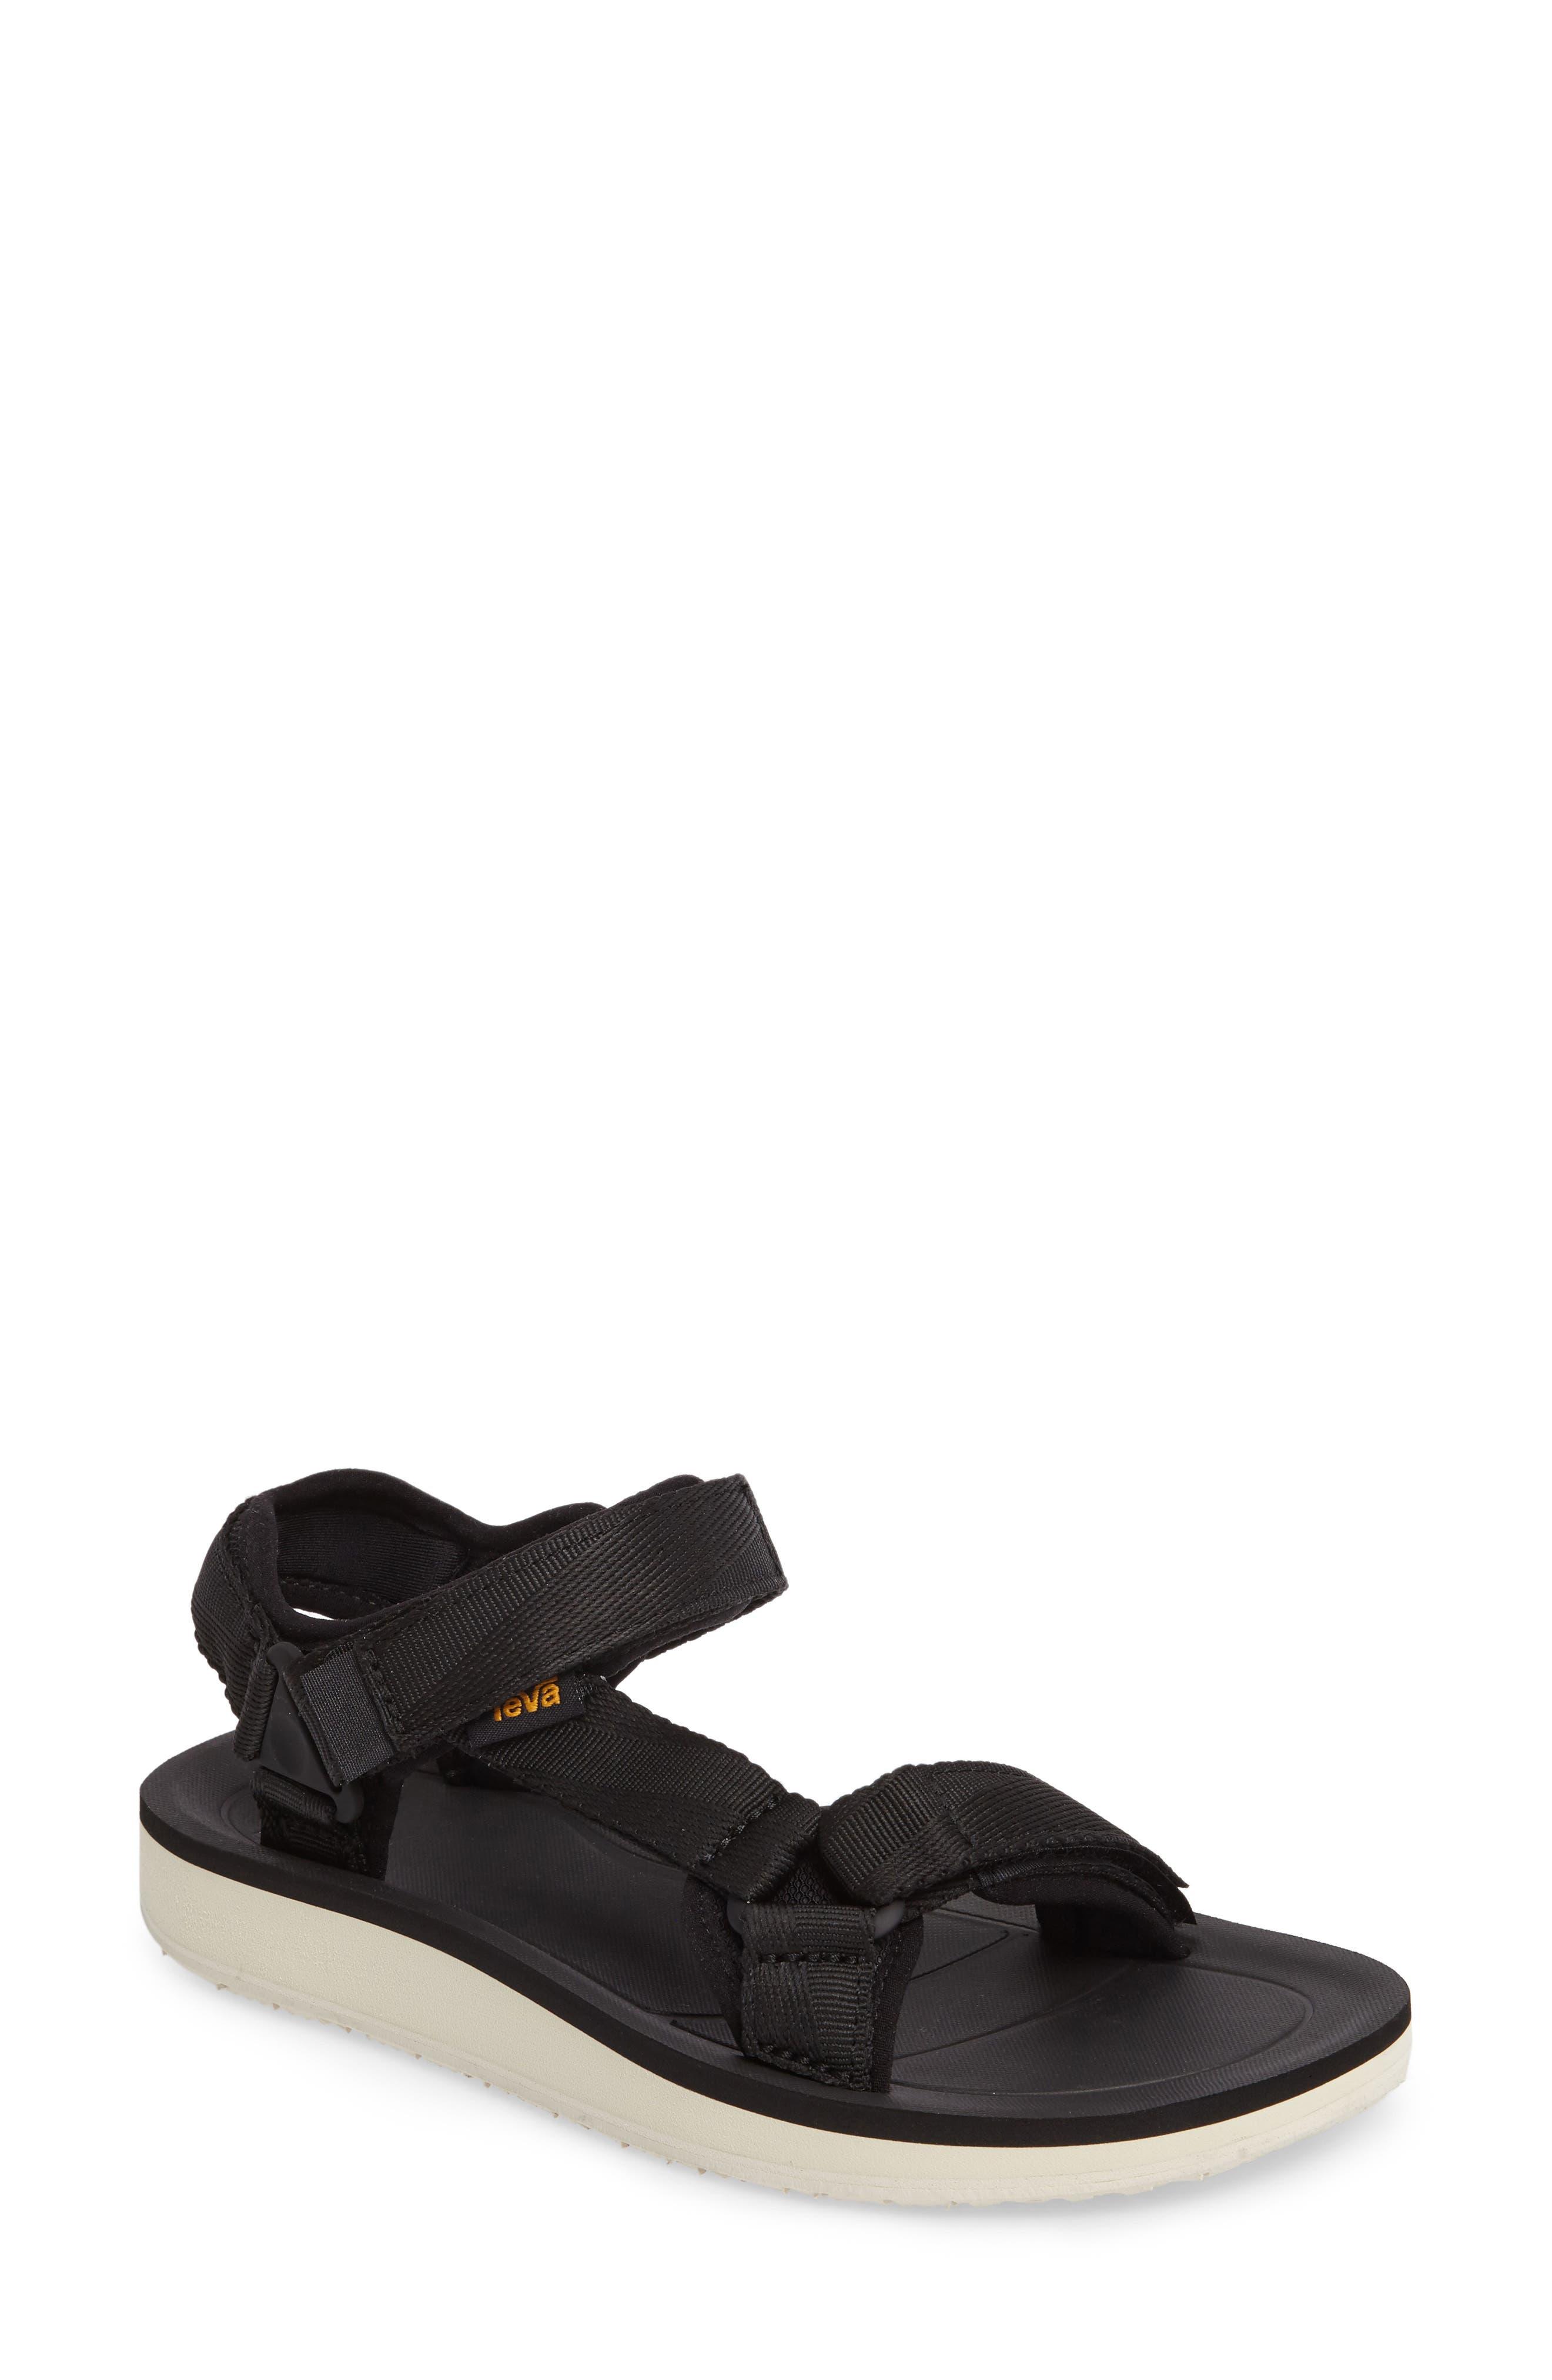 Original Universal Premier Sandal,                         Main,                         color, Black Fabric